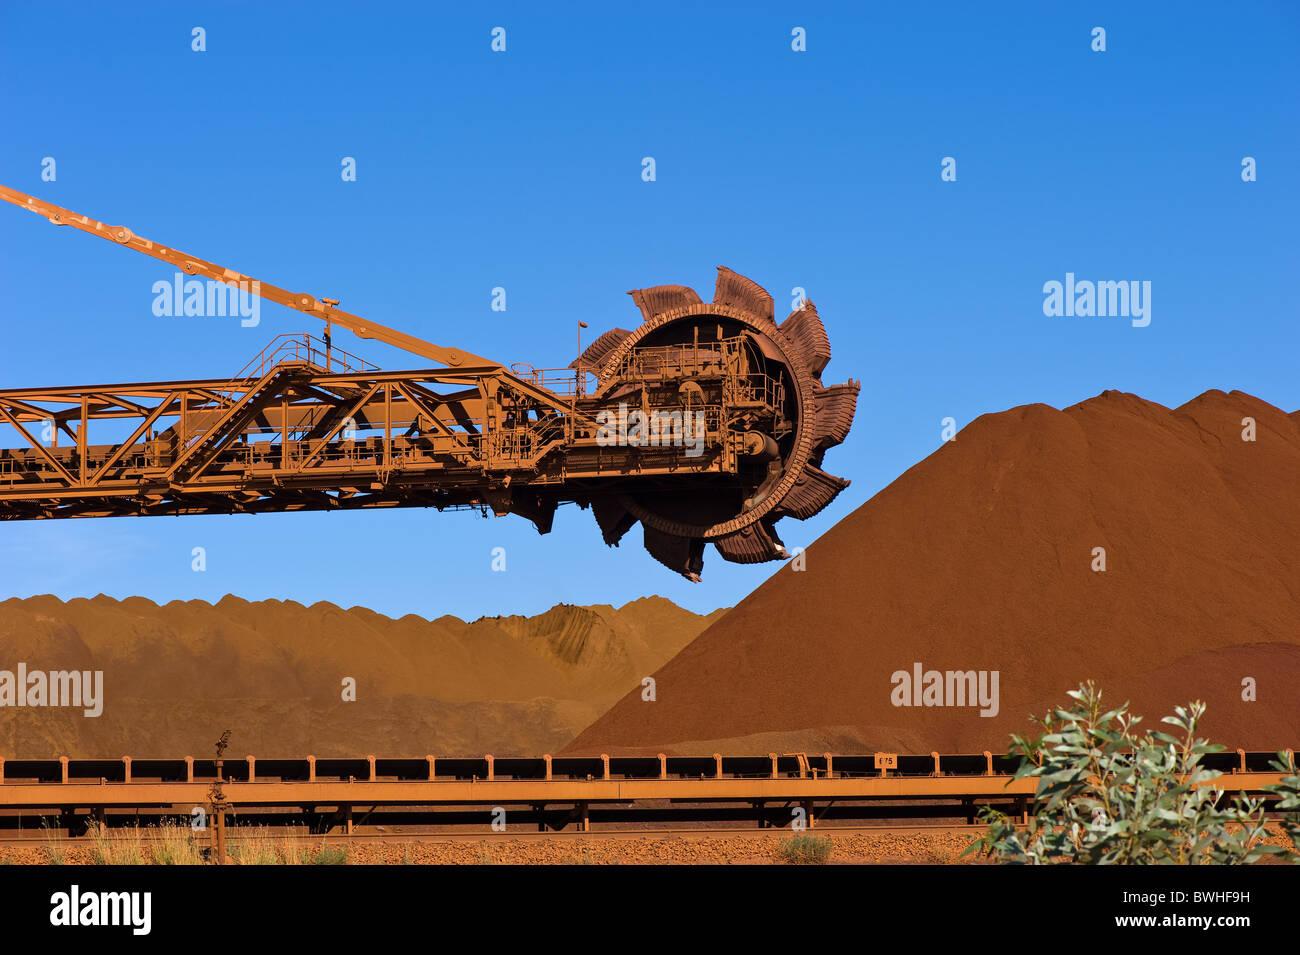 Iron Ore mining Pilbara Western Australia - Stock Image